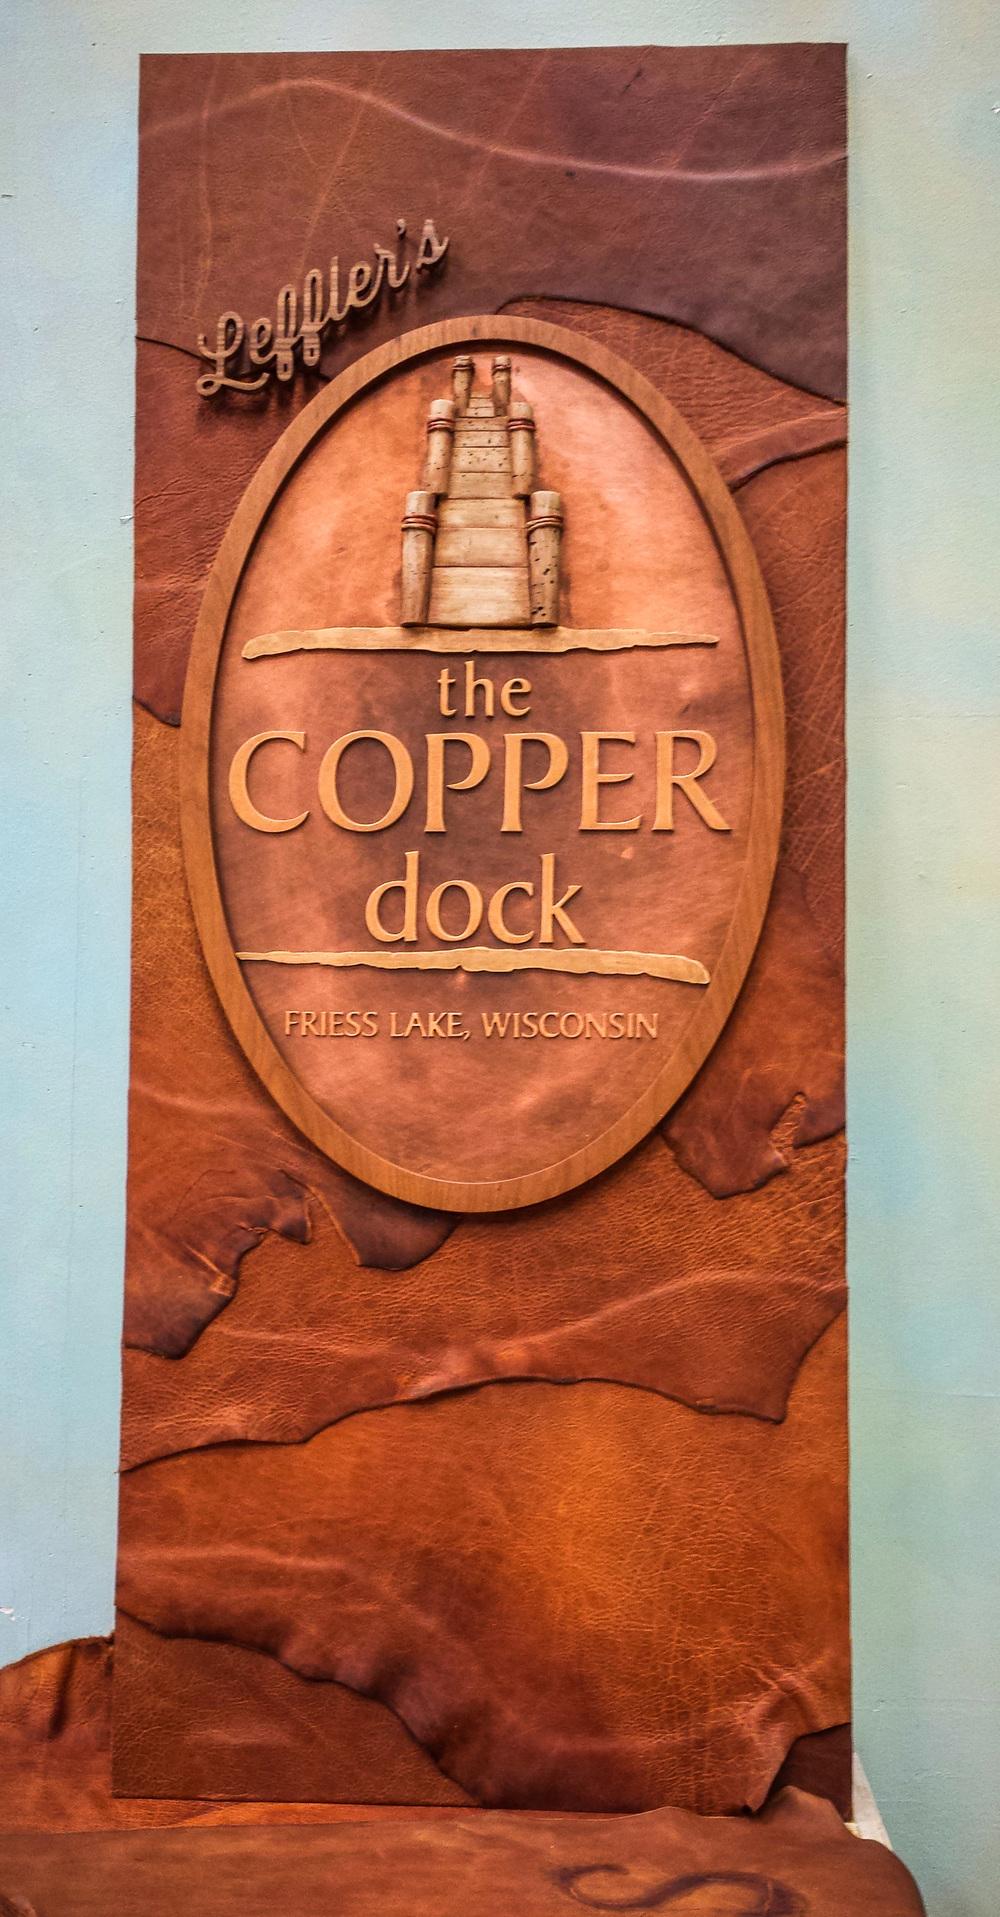 copperdock_signage-1.jpg